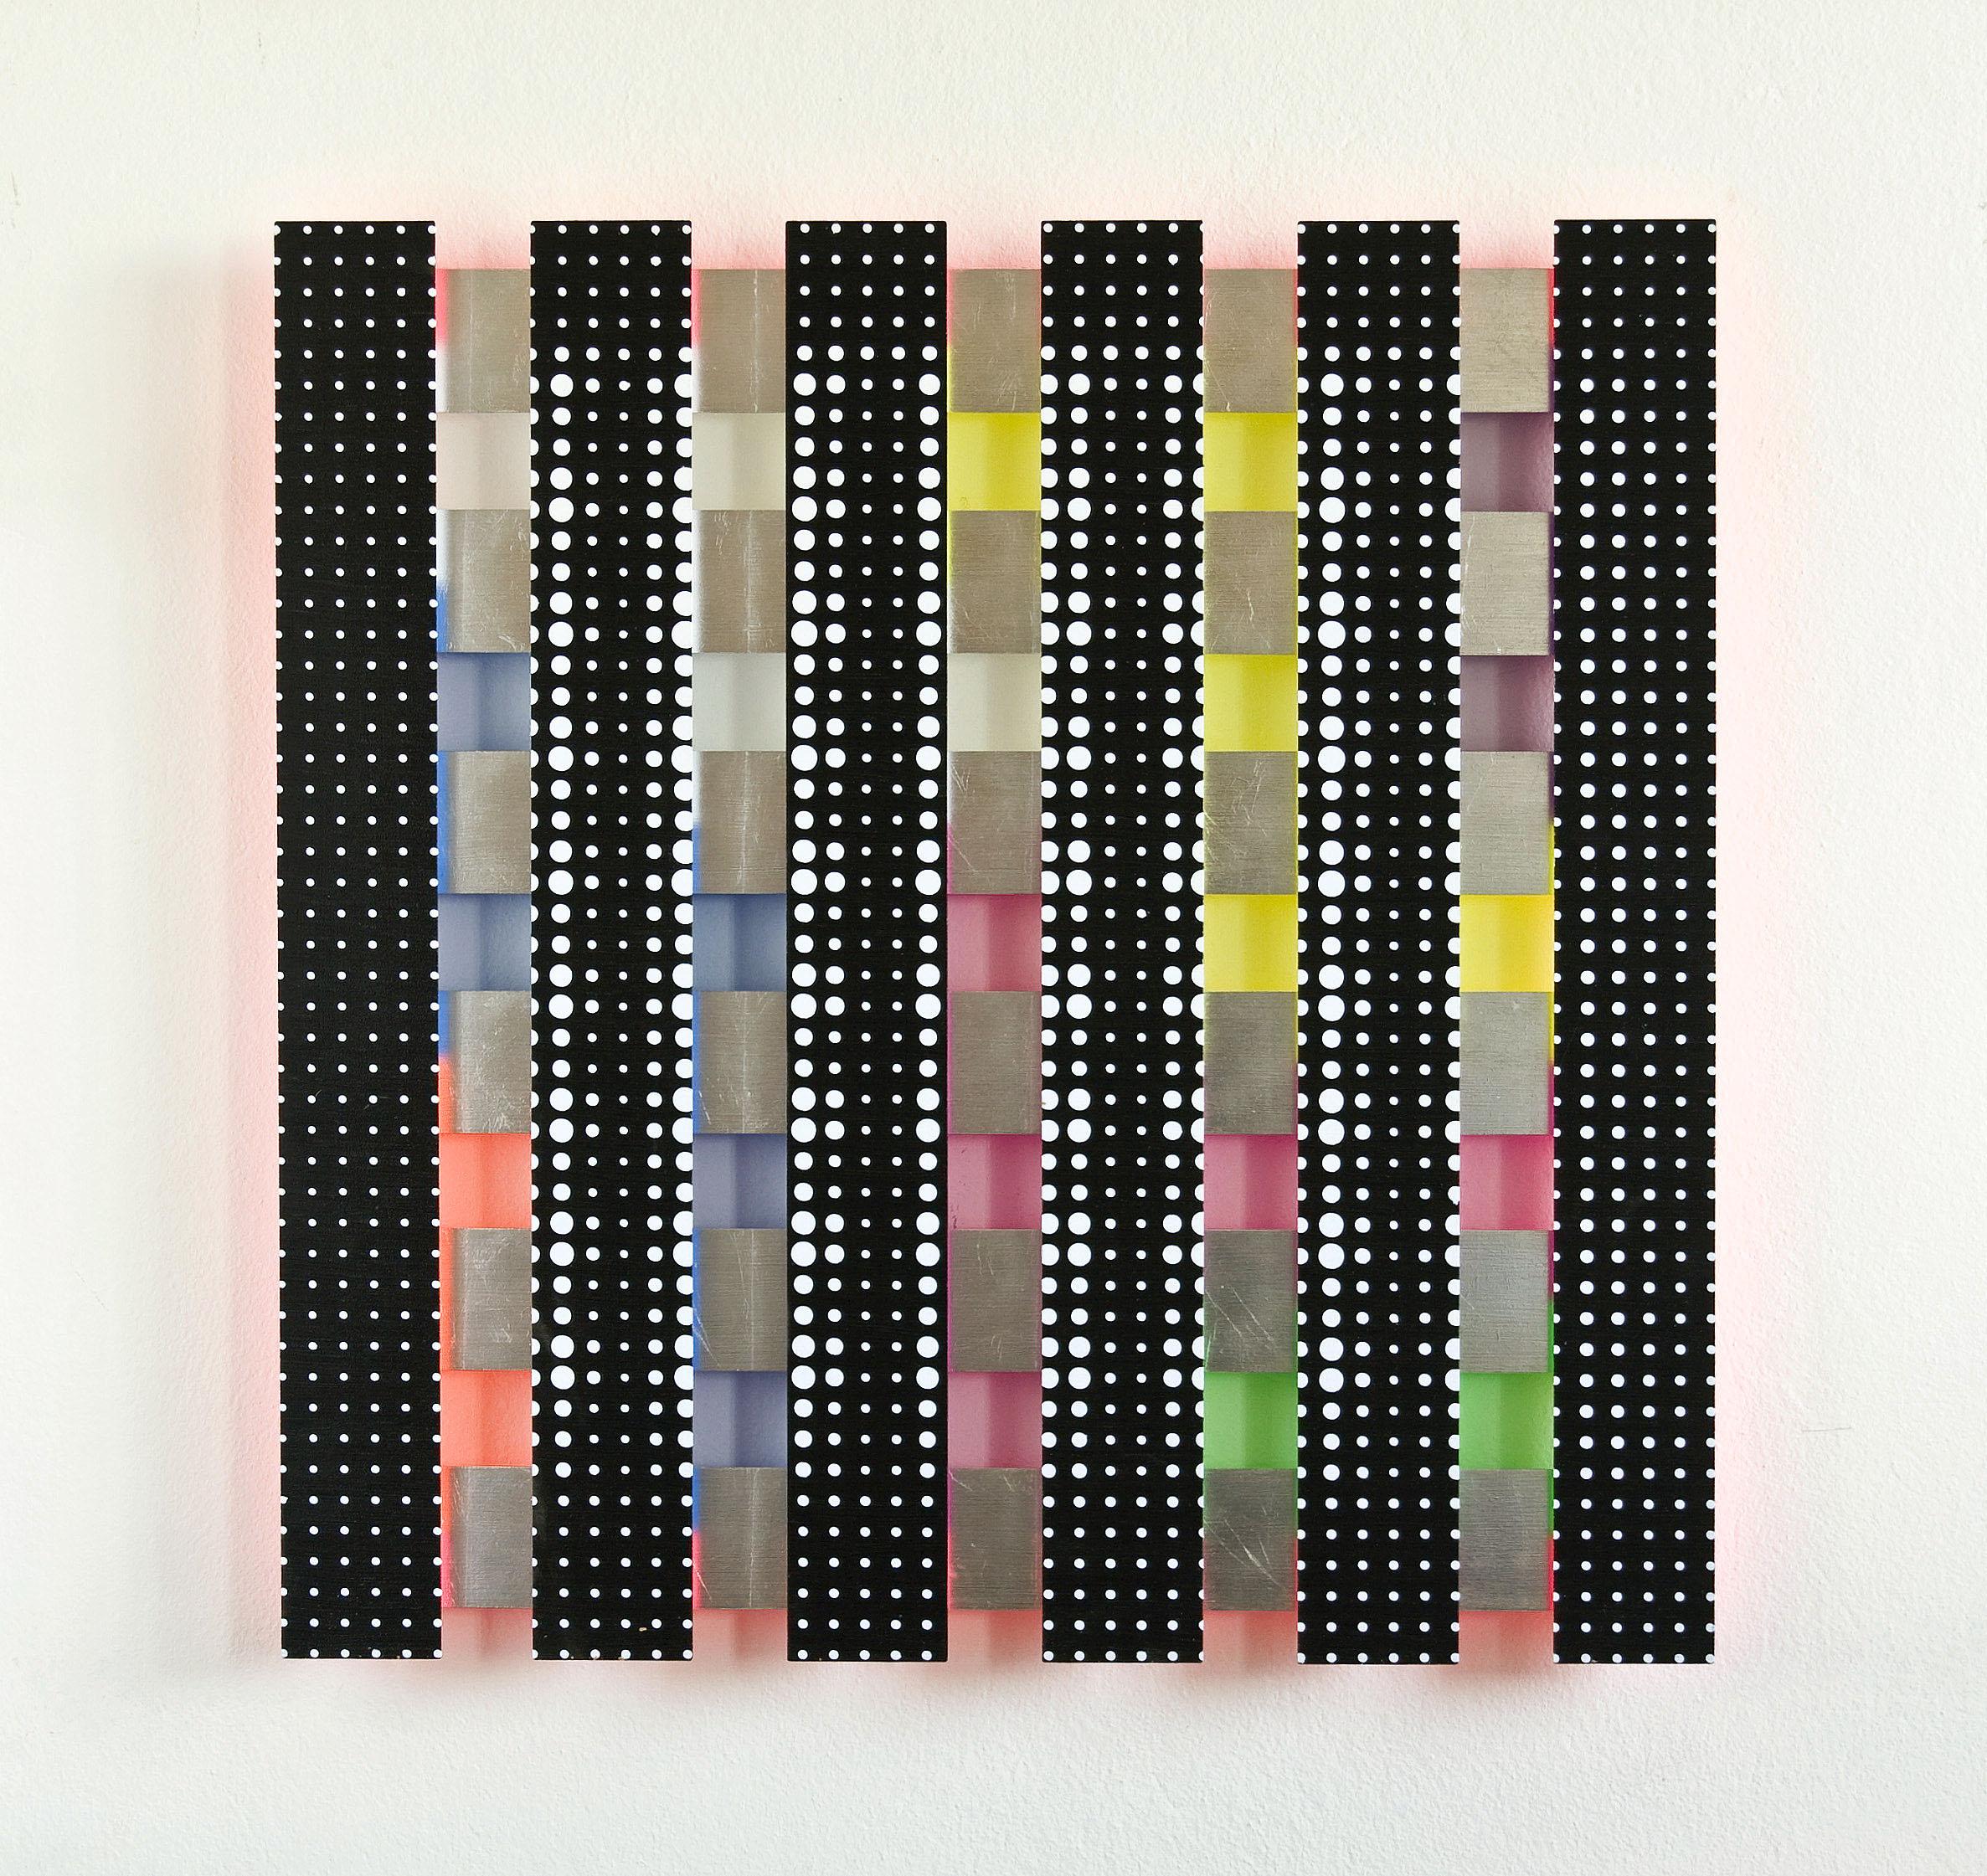 2t akril, les, 79 x 79 cm, 2010.jpg